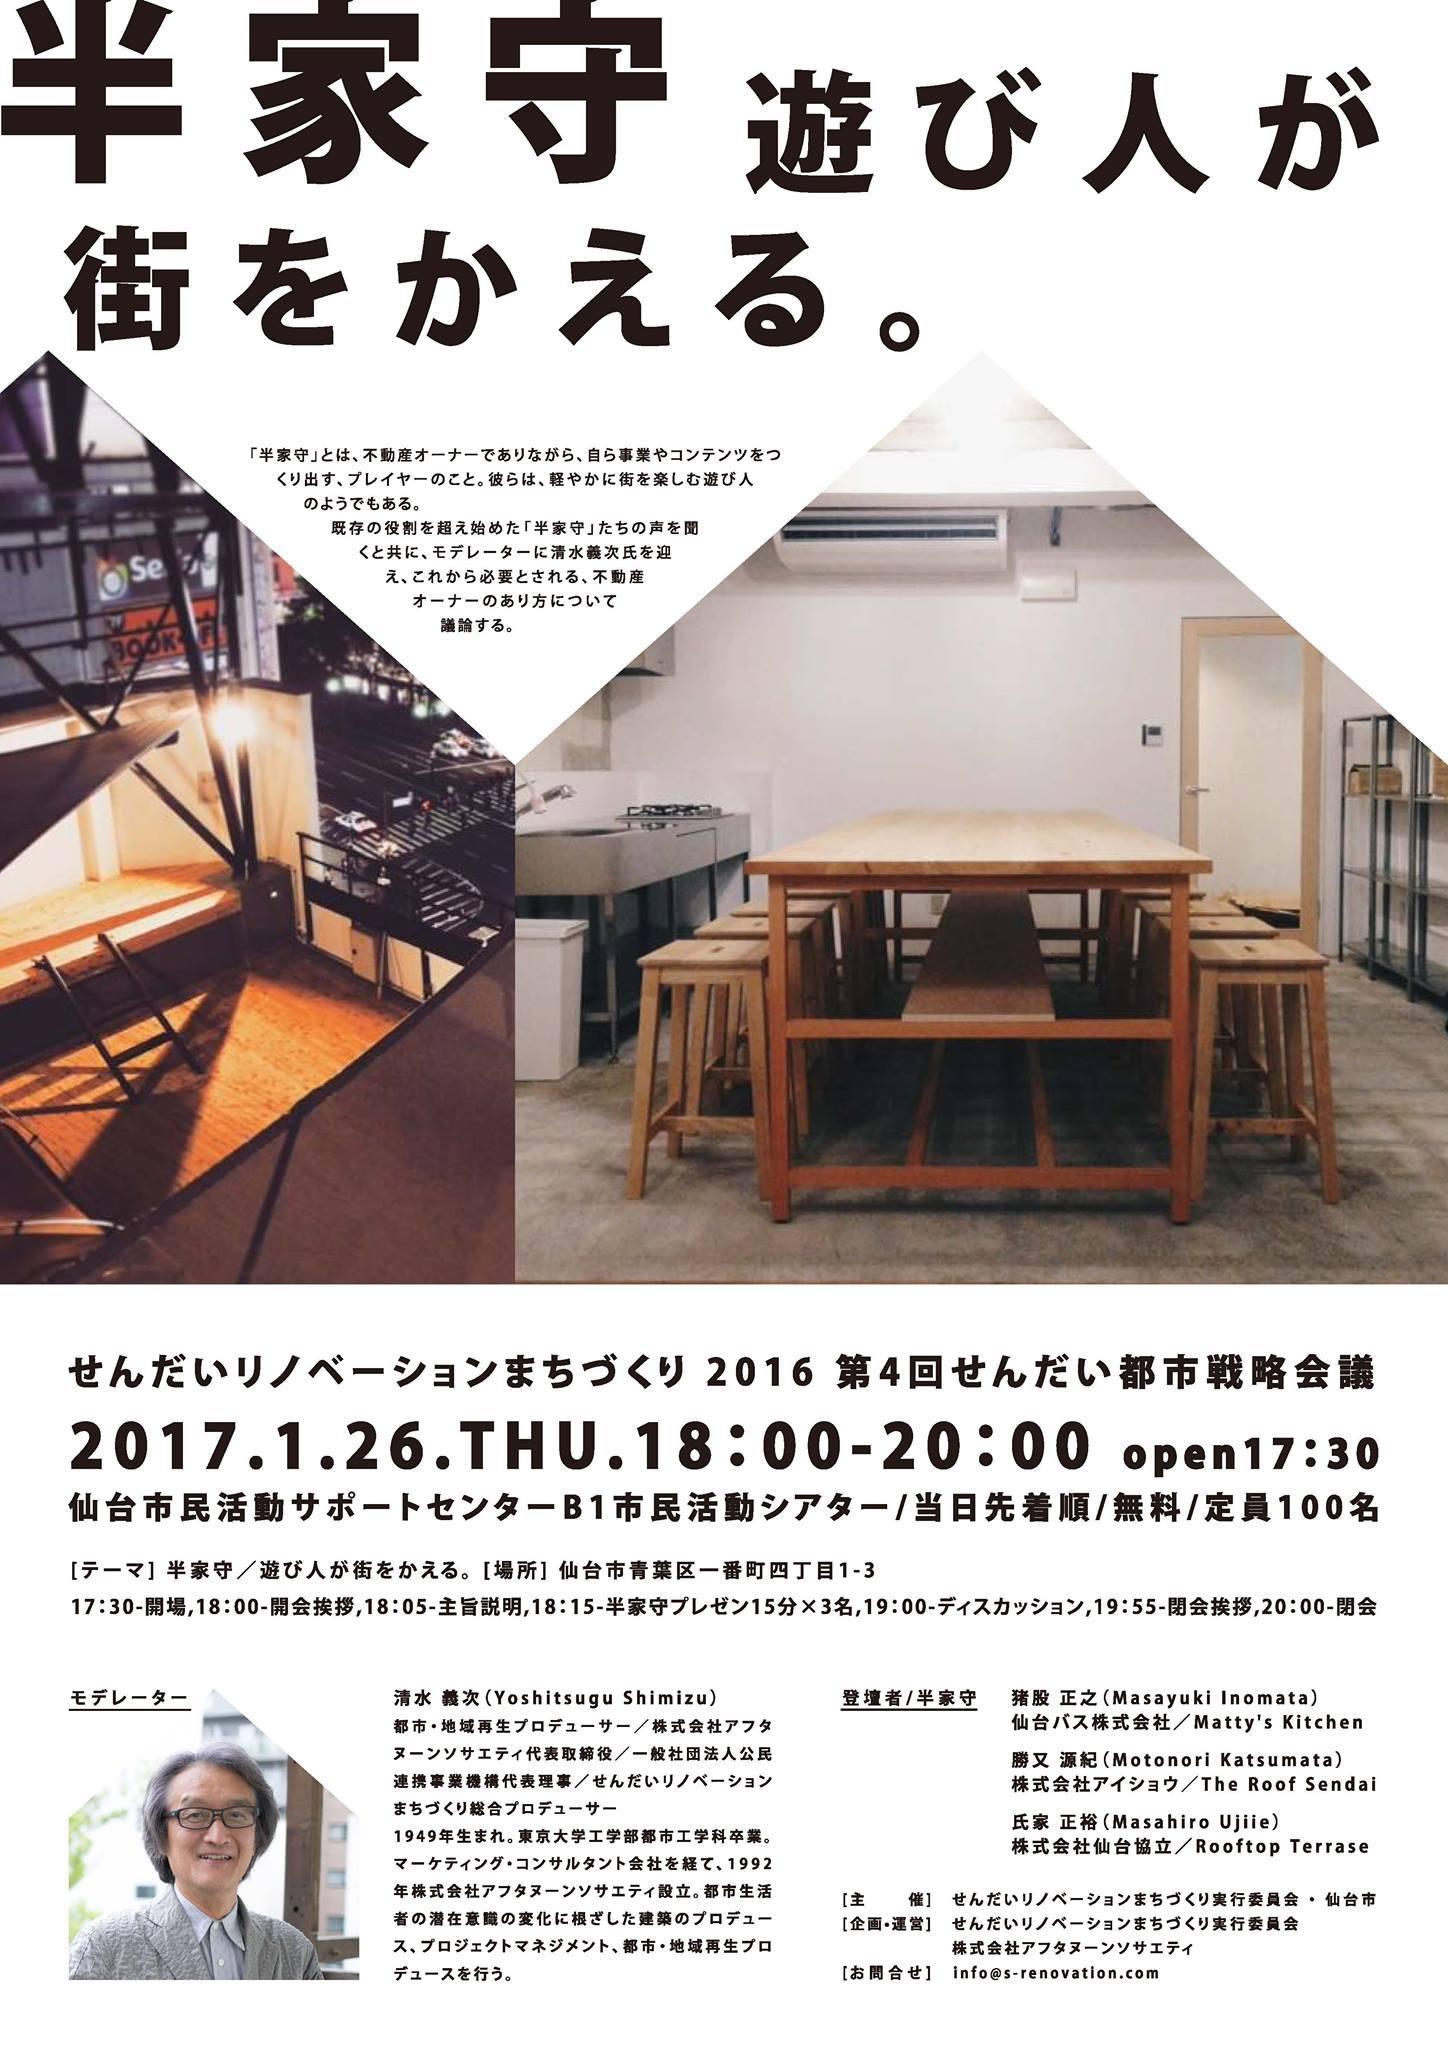 SRM=仙台リノベーション街づくり...